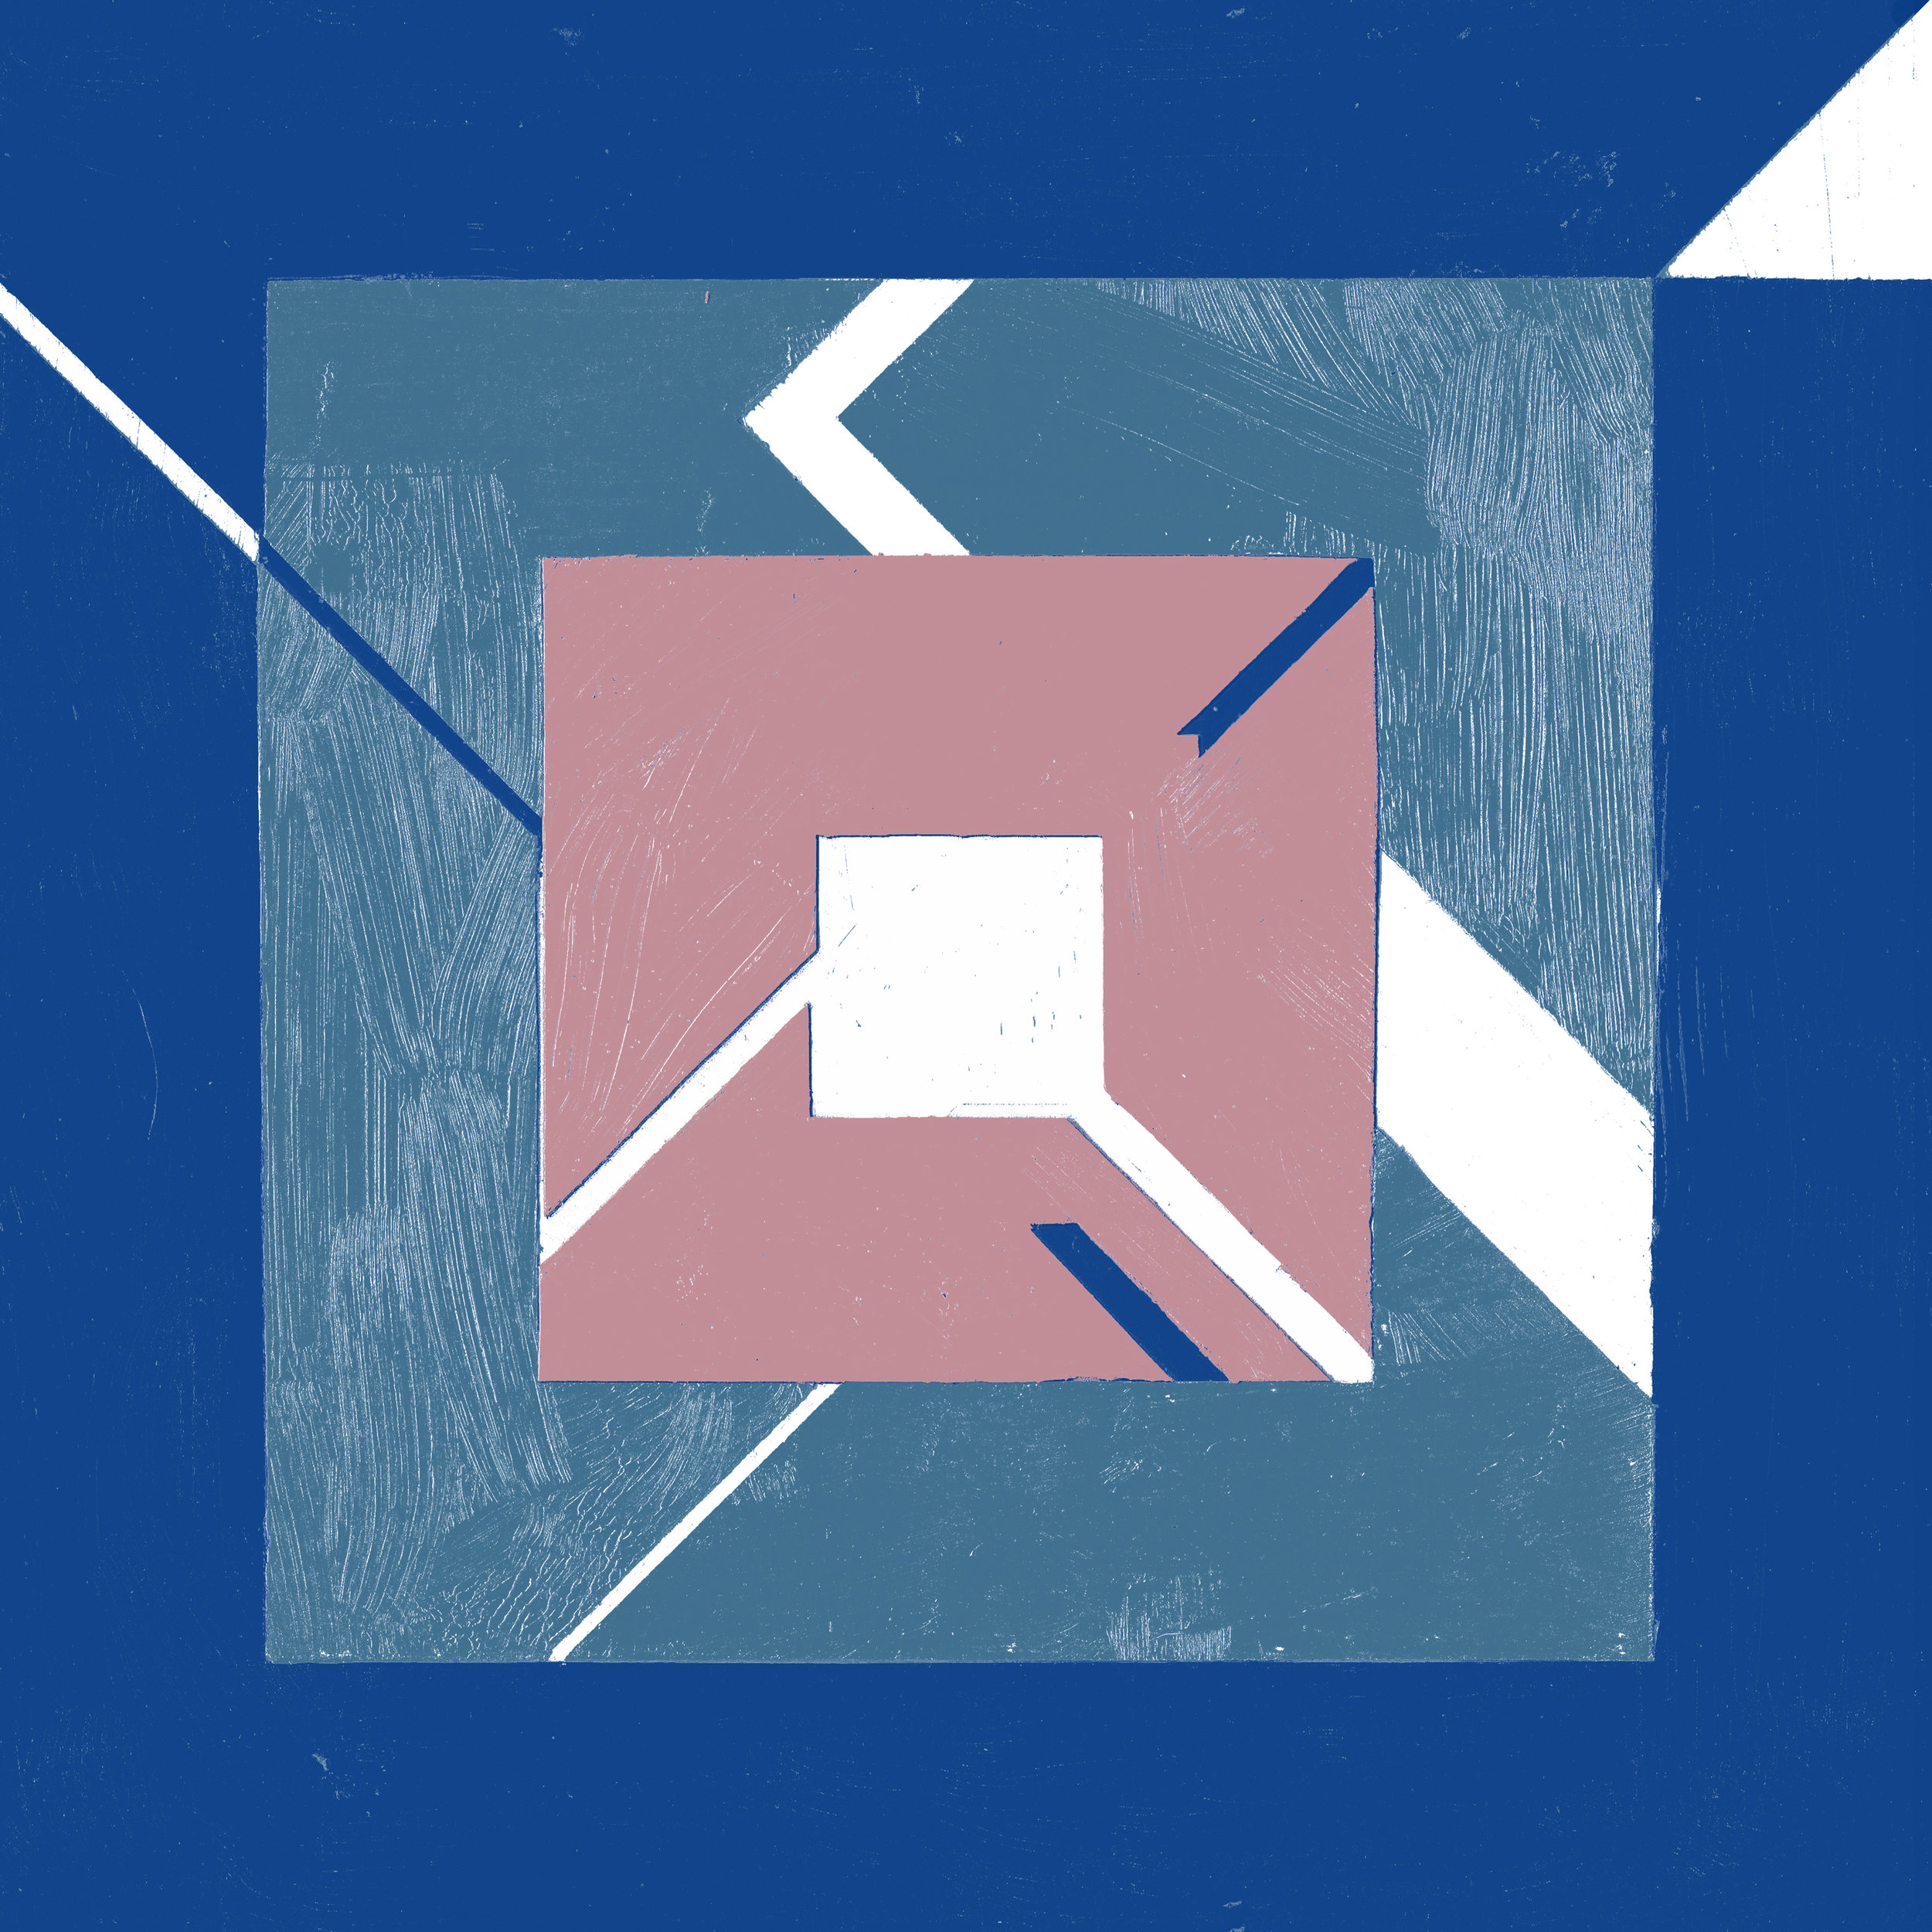 Album artwork by Paul Rafferty